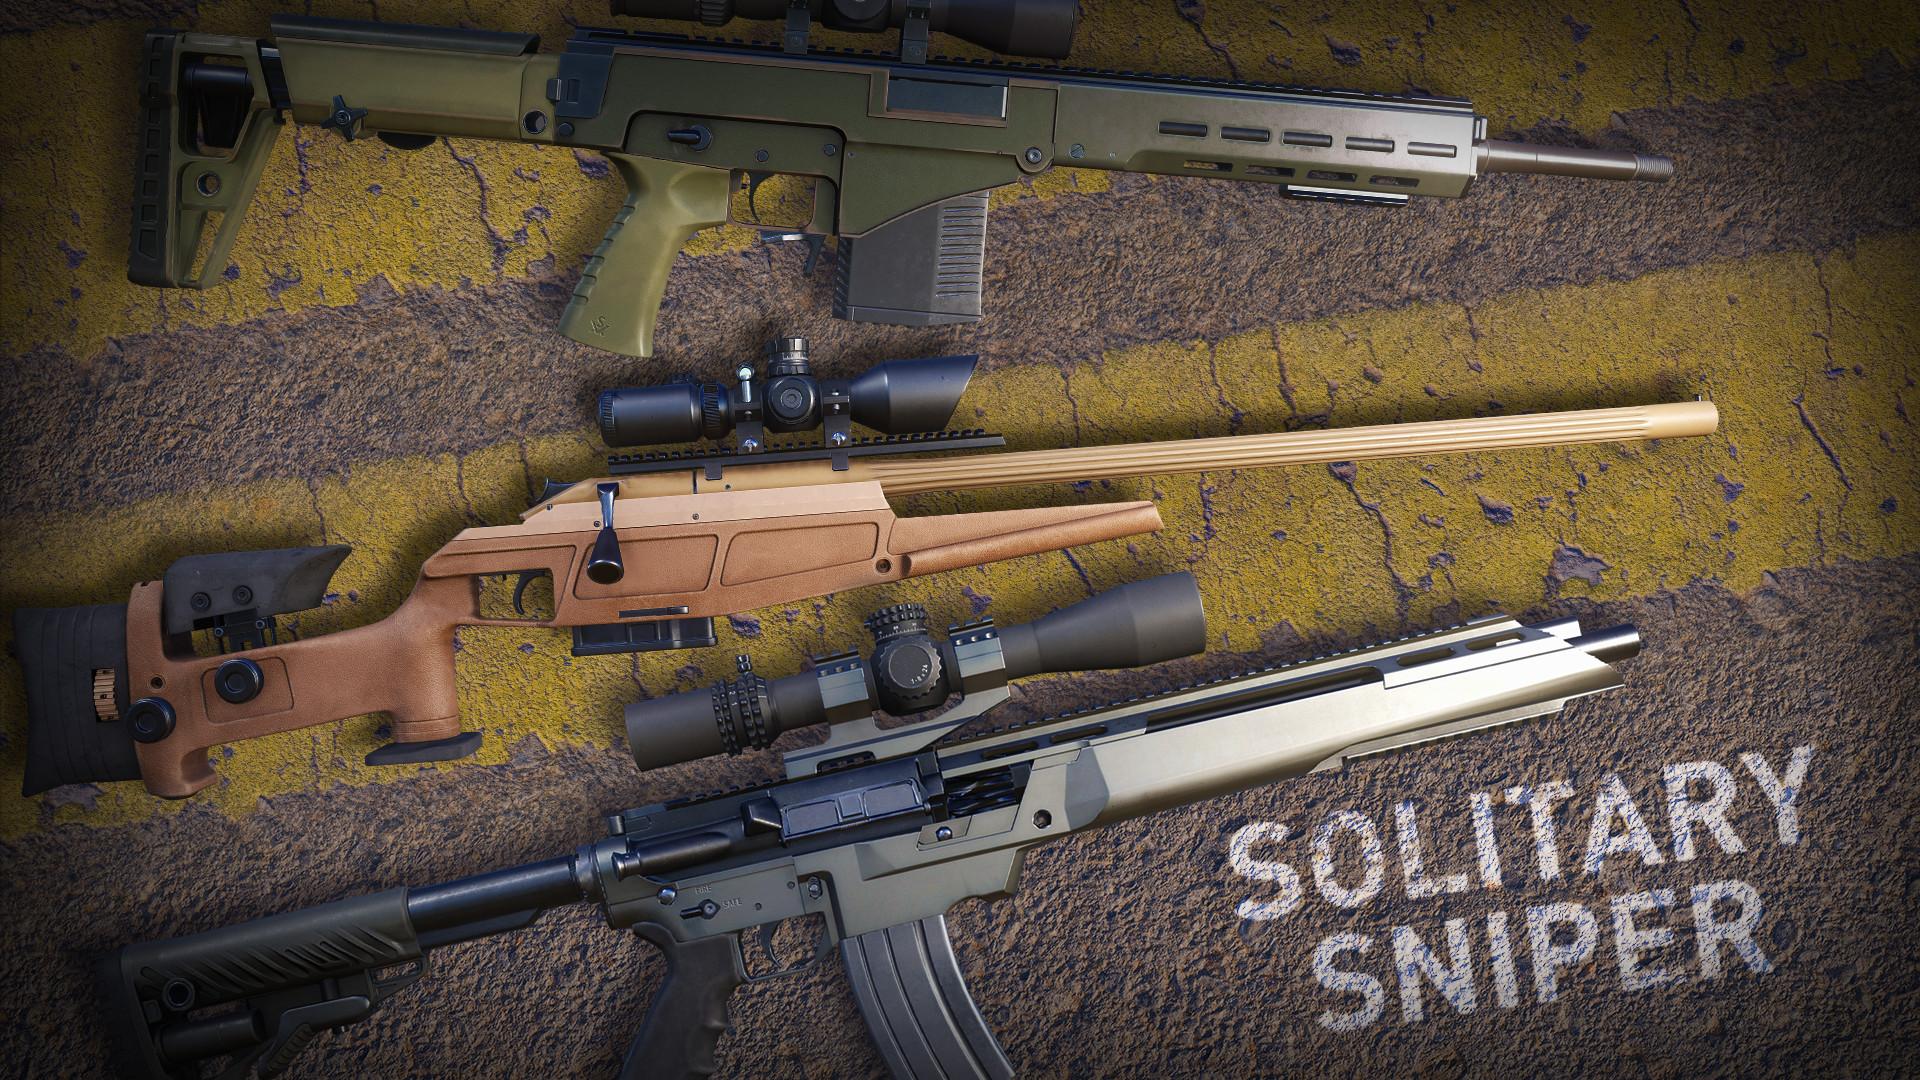 Sniper Ghost Warrior Contracts 2 - Solitary Sniper Weapons Pack Fiyat Karşılaştırma